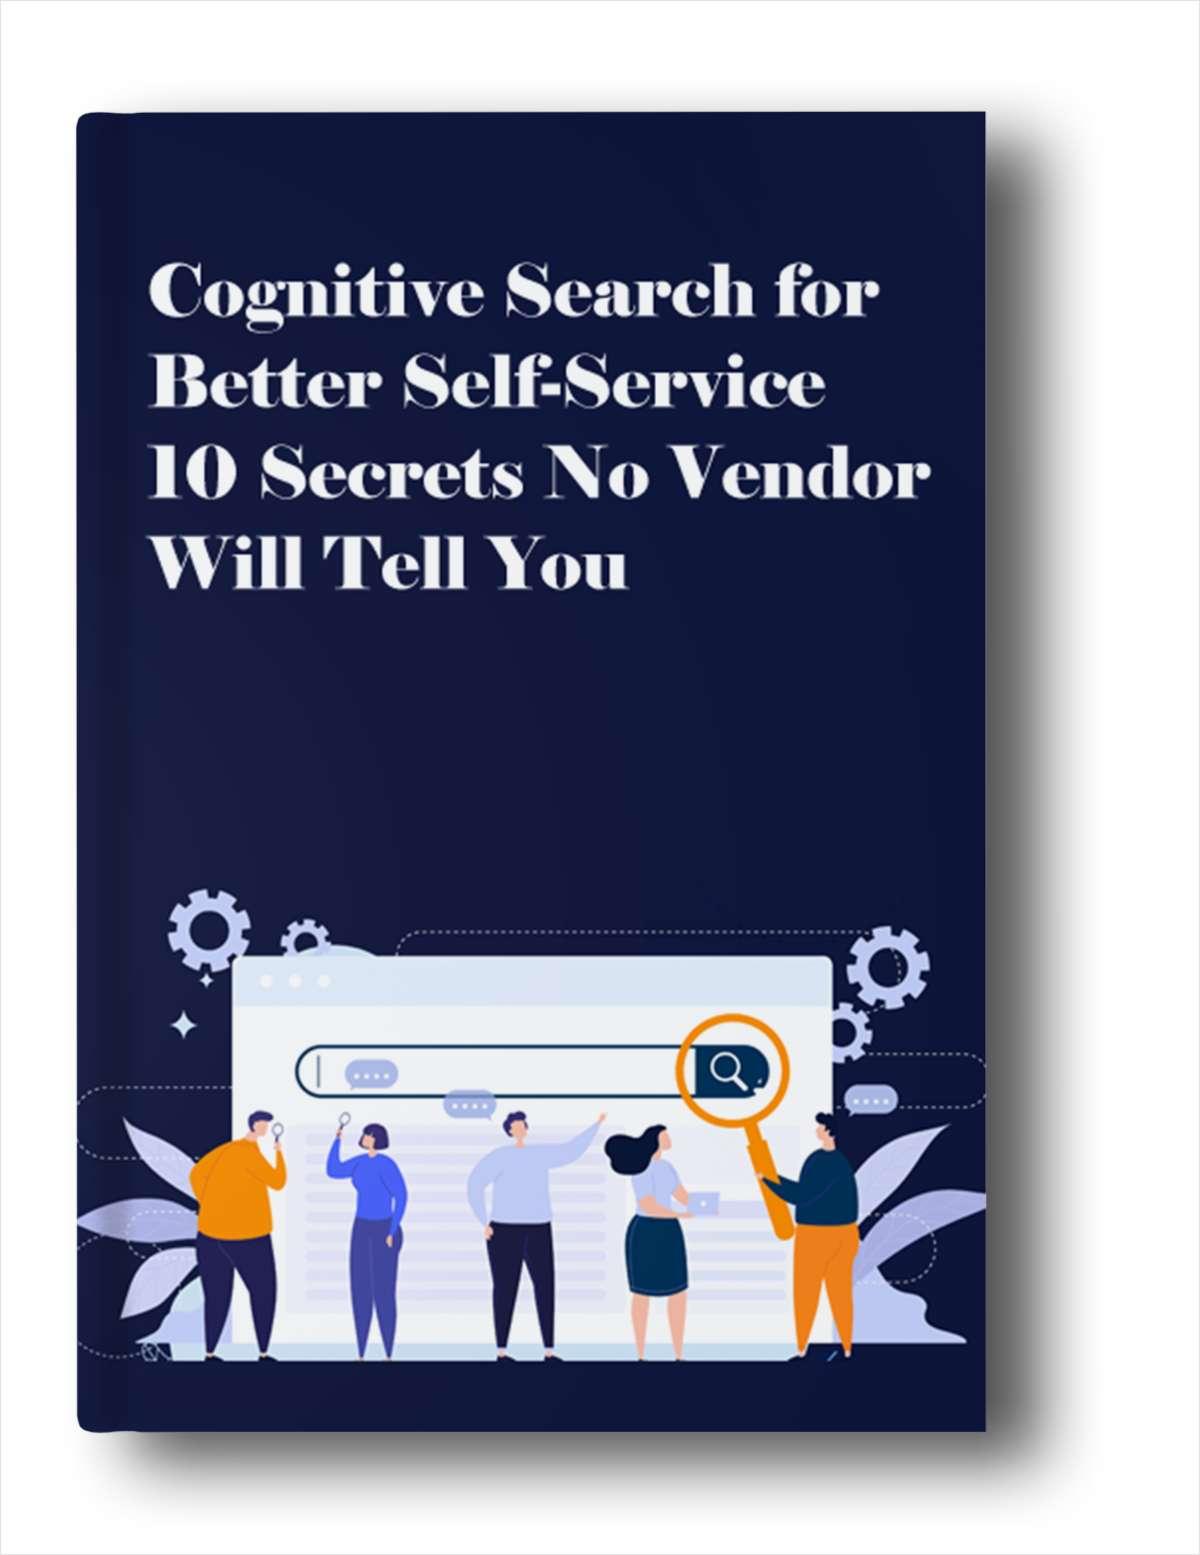 Cognitive Search For Better Self-Service: 10 Secrets No Vendor Will Tell You